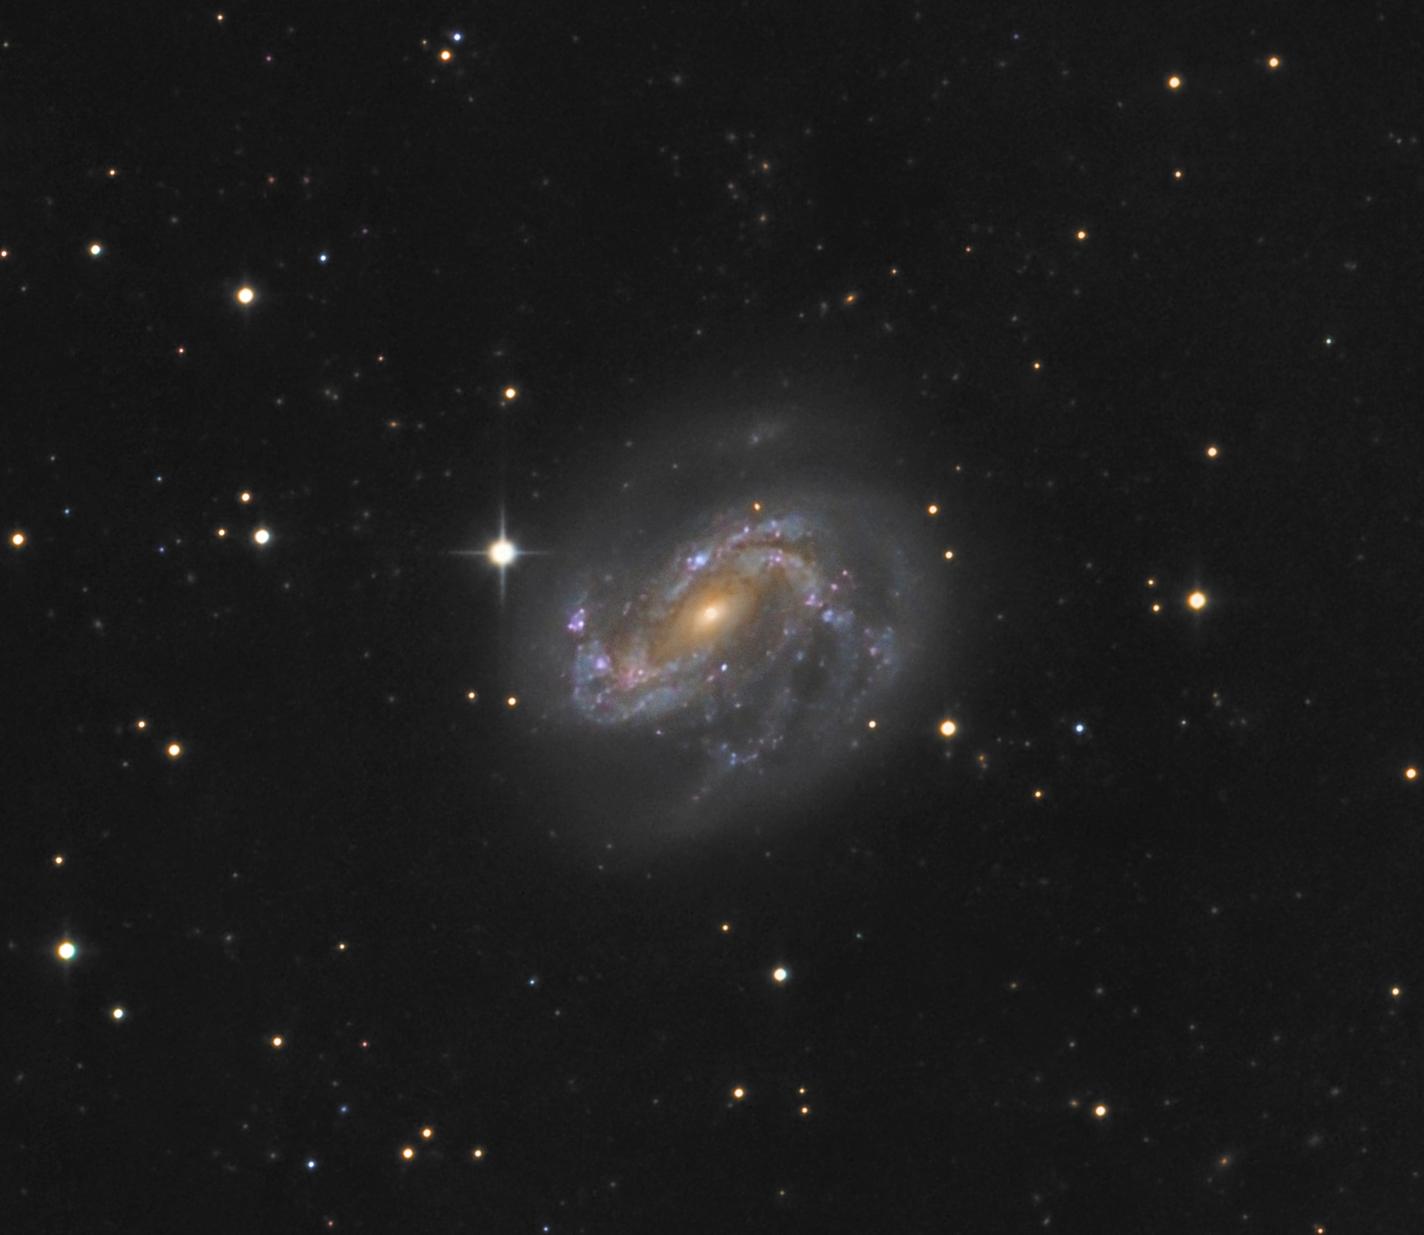 NGC_4051_crop.jpg